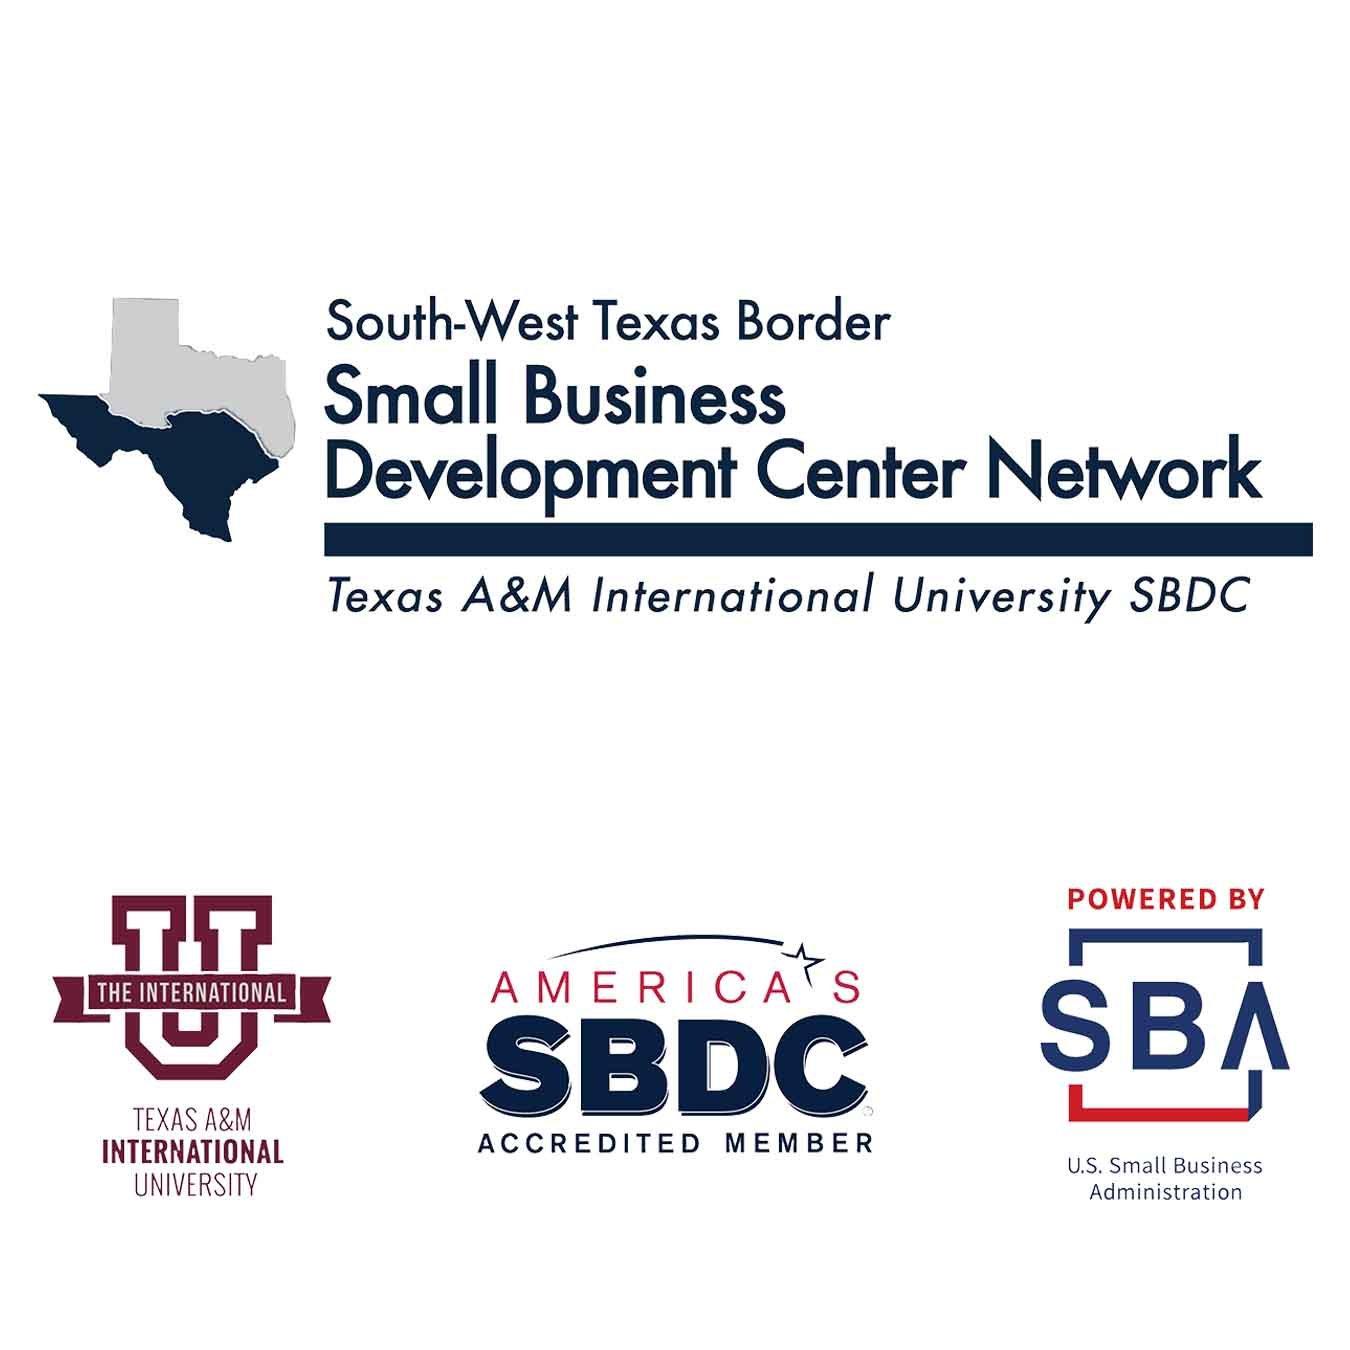 TAMIU SBC Texas A&M International University Small Business Development Center